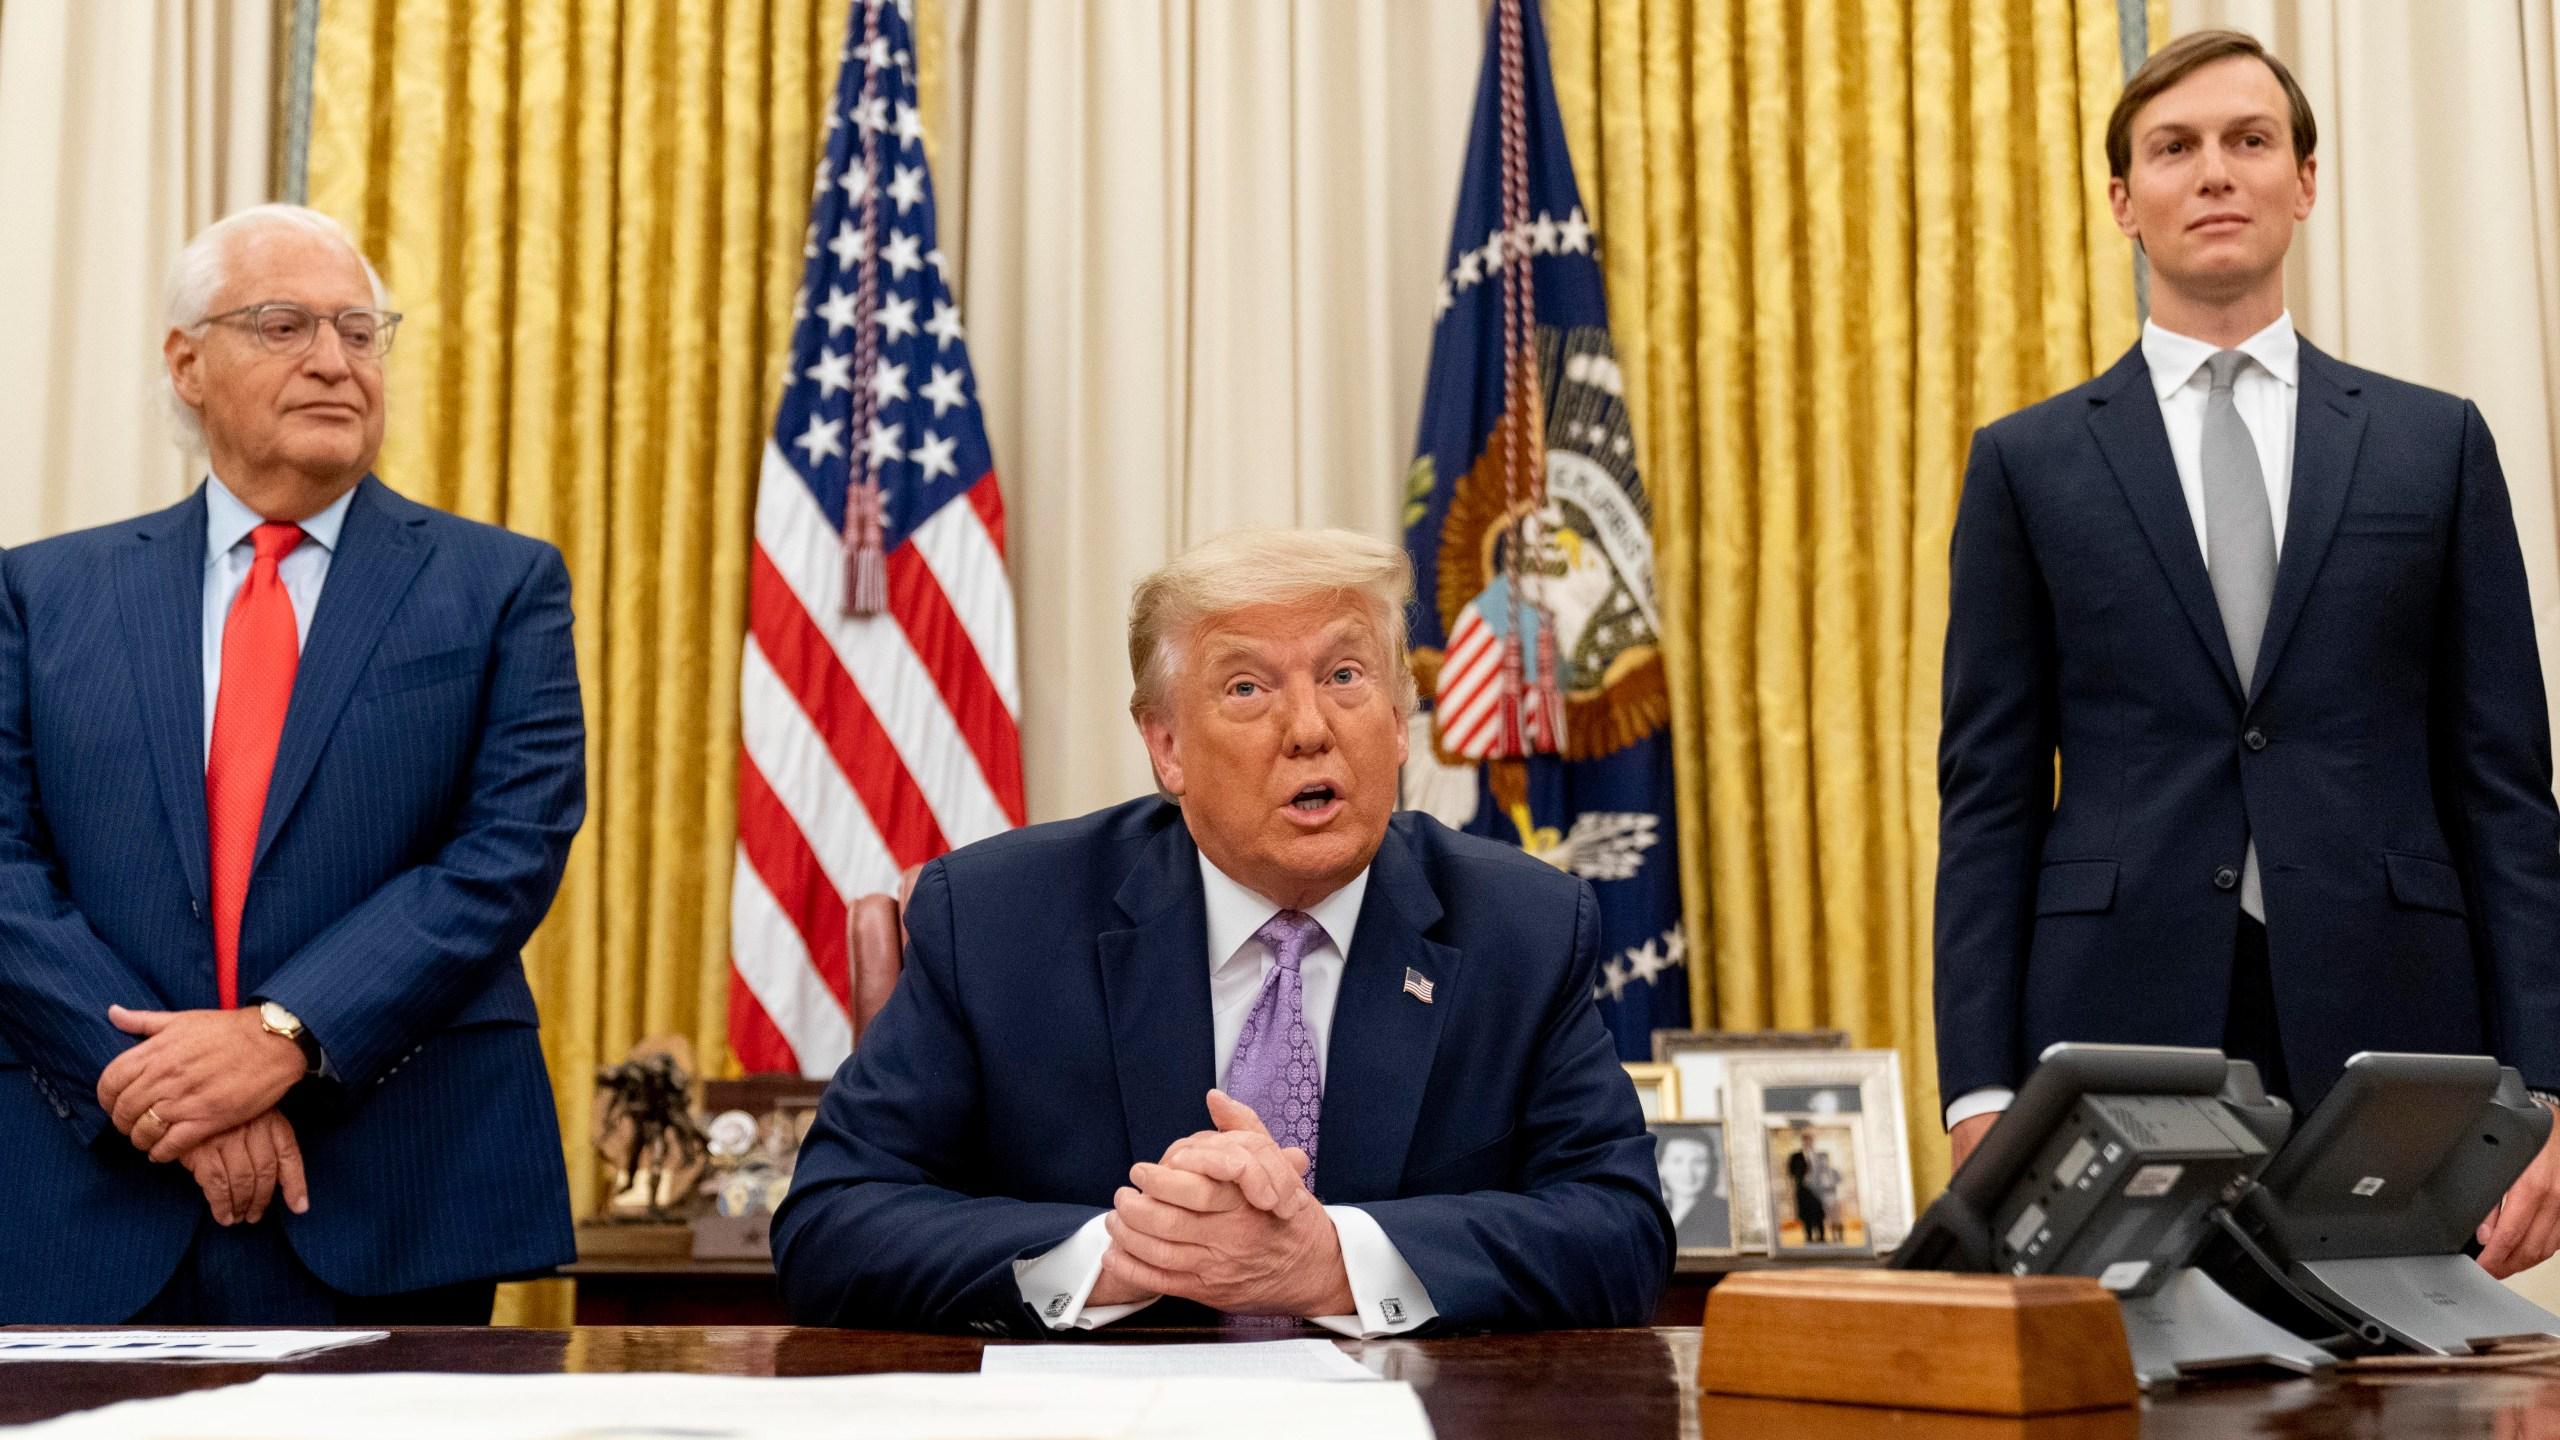 Donald Trump, David Friedman, Jared Kushner